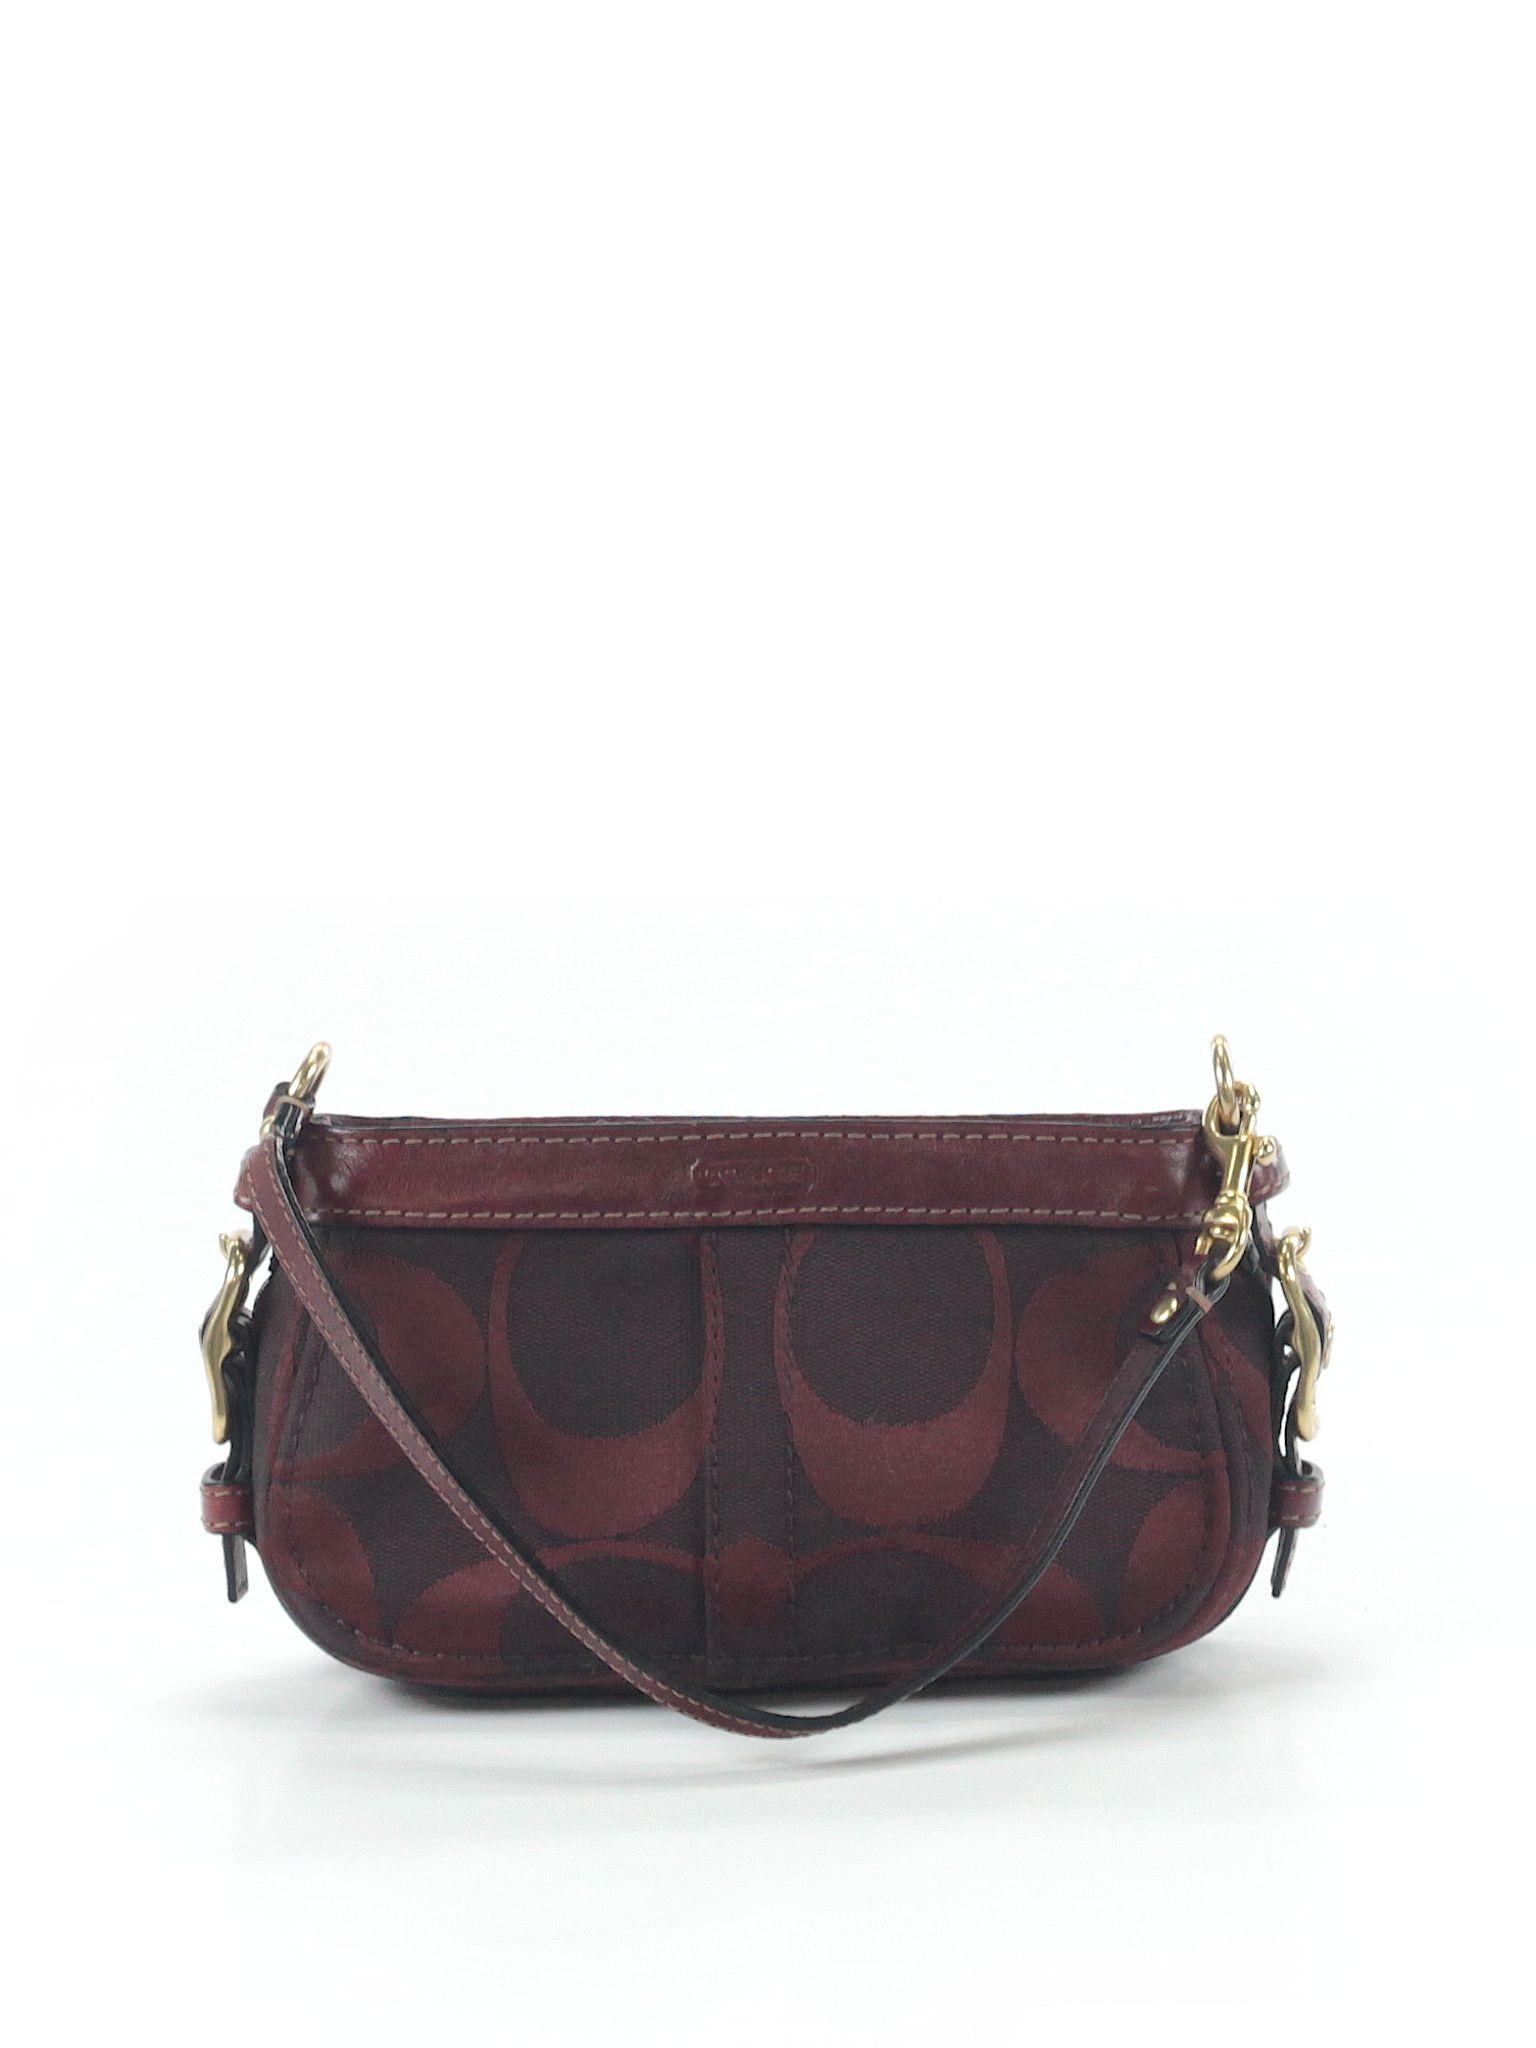 425ce7cff2a6 Coach Shoulder Bag  Burgundy Women s Bags - 26760604